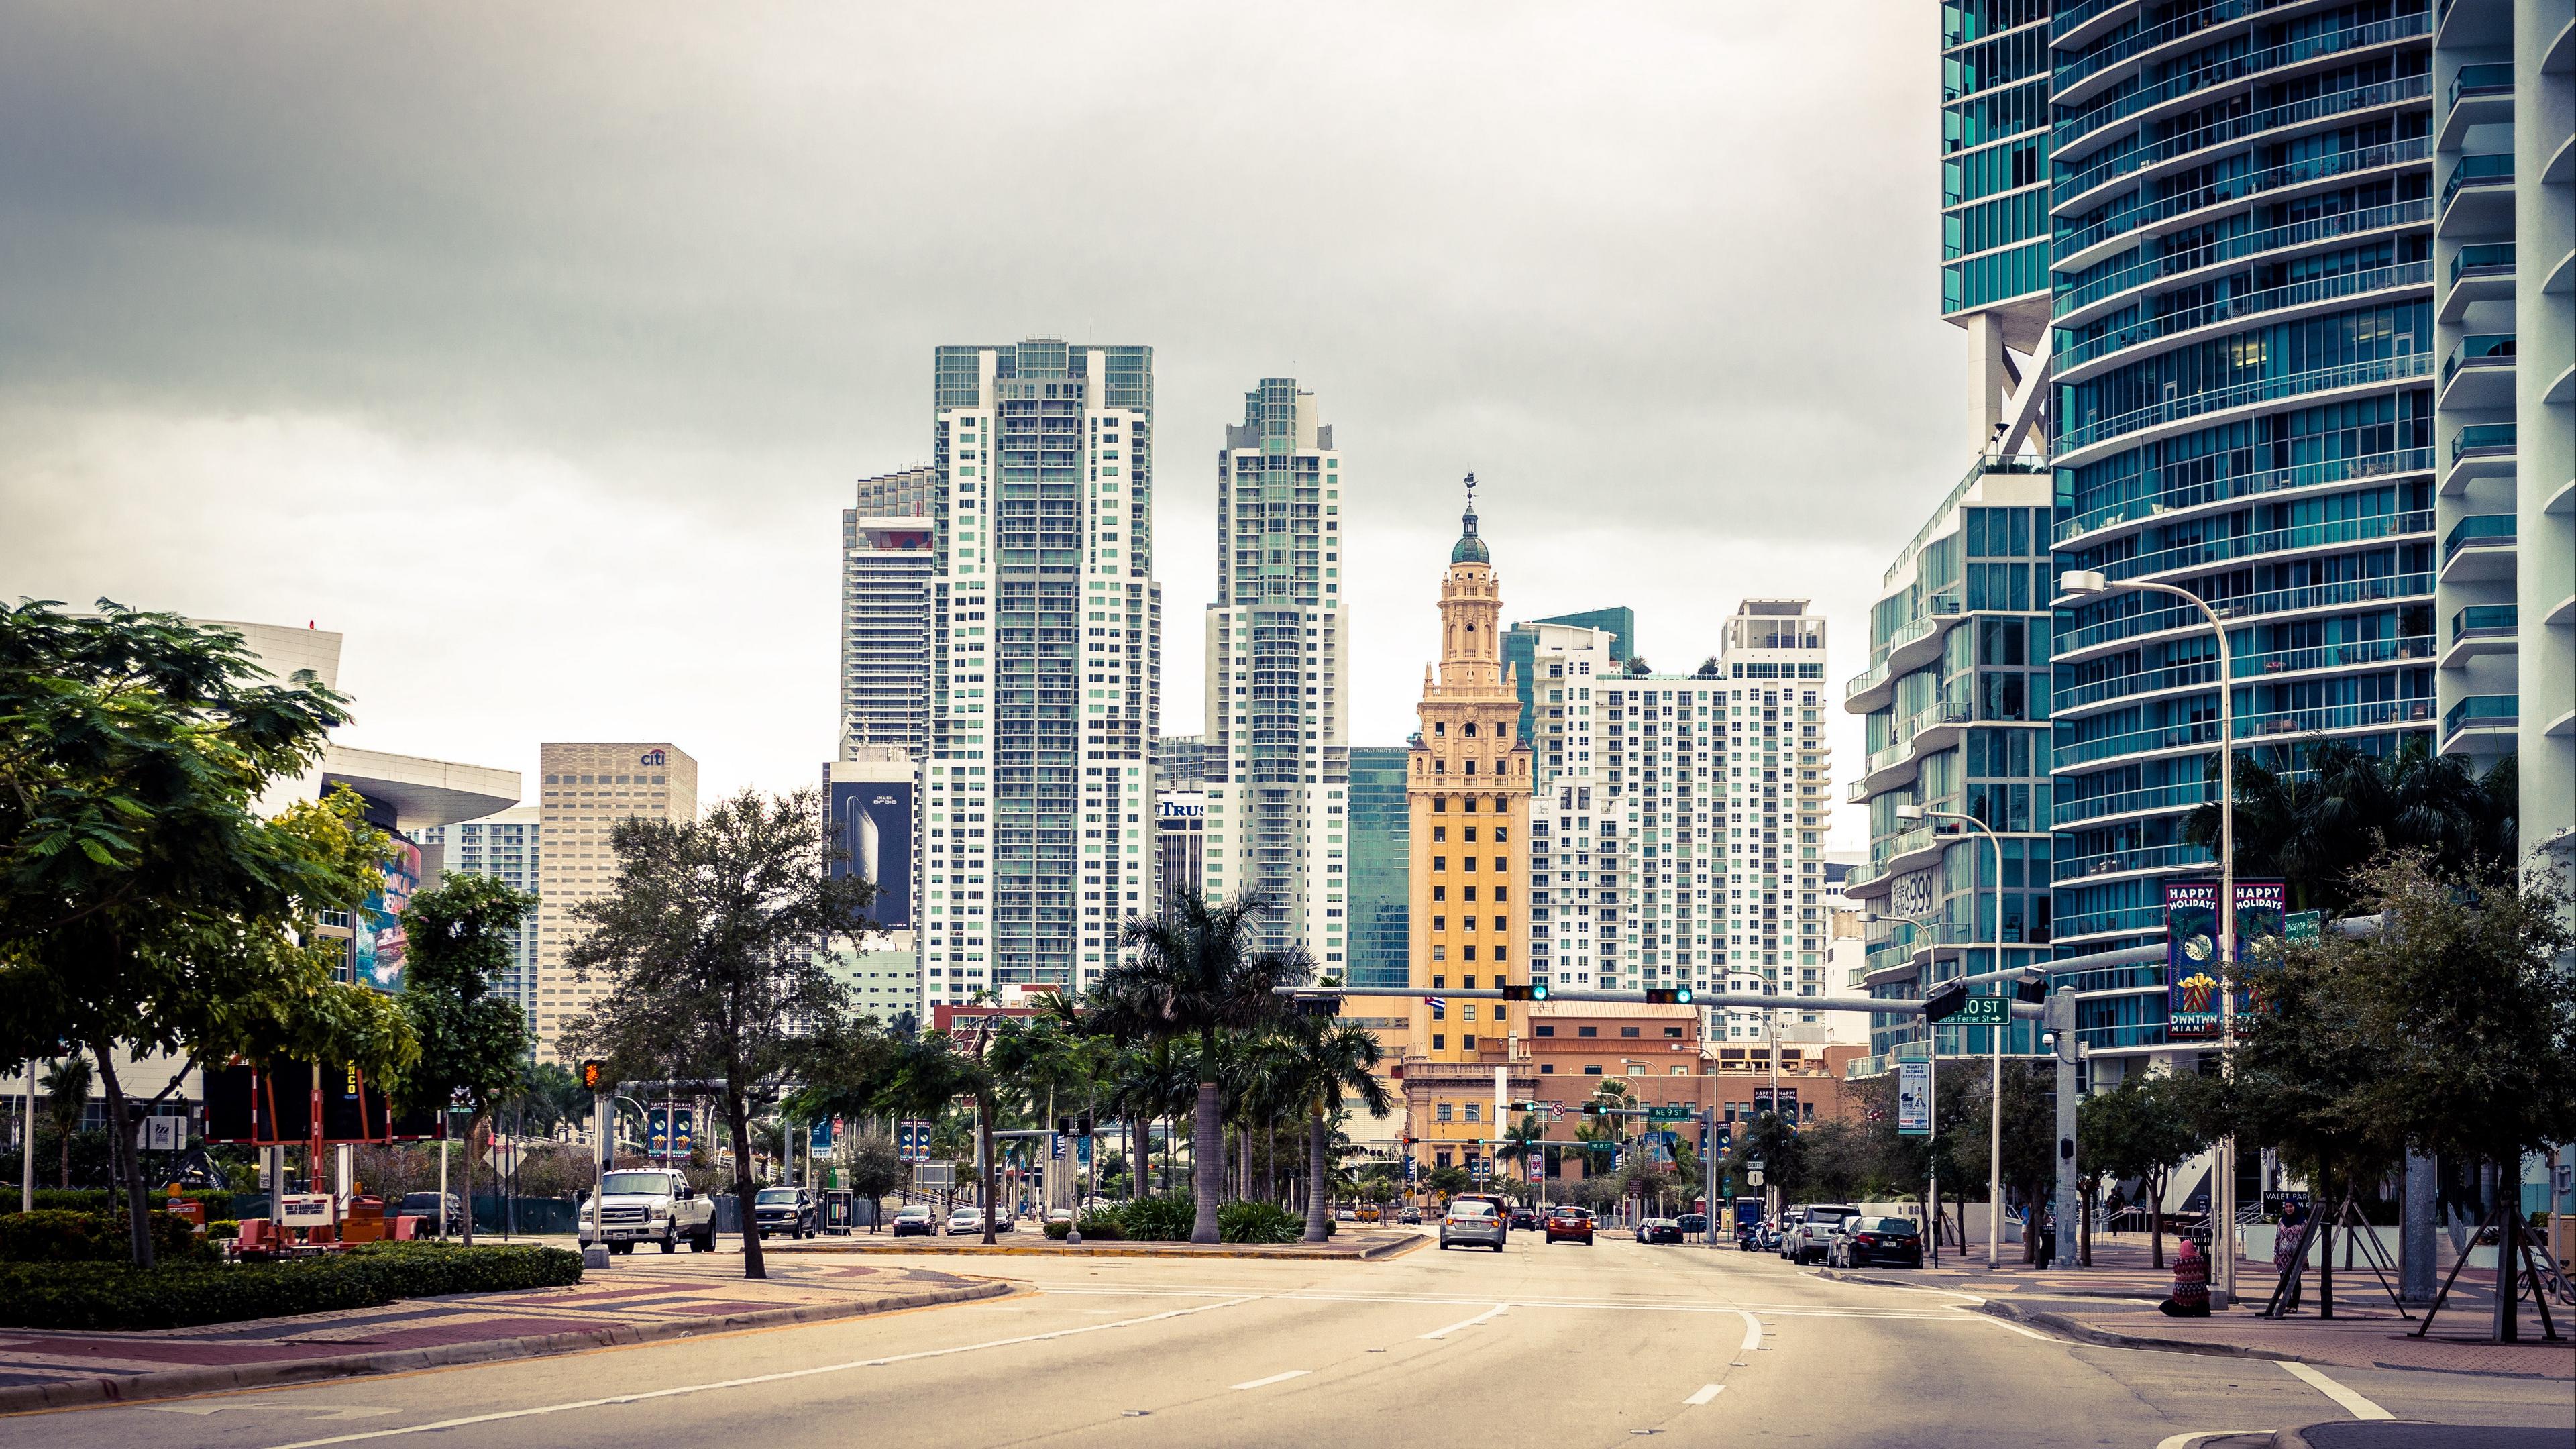 miami florida usa skyscraper street 4k 1538068751 - miami, florida, usa, skyscraper, street 4k - USA, Miami, florida